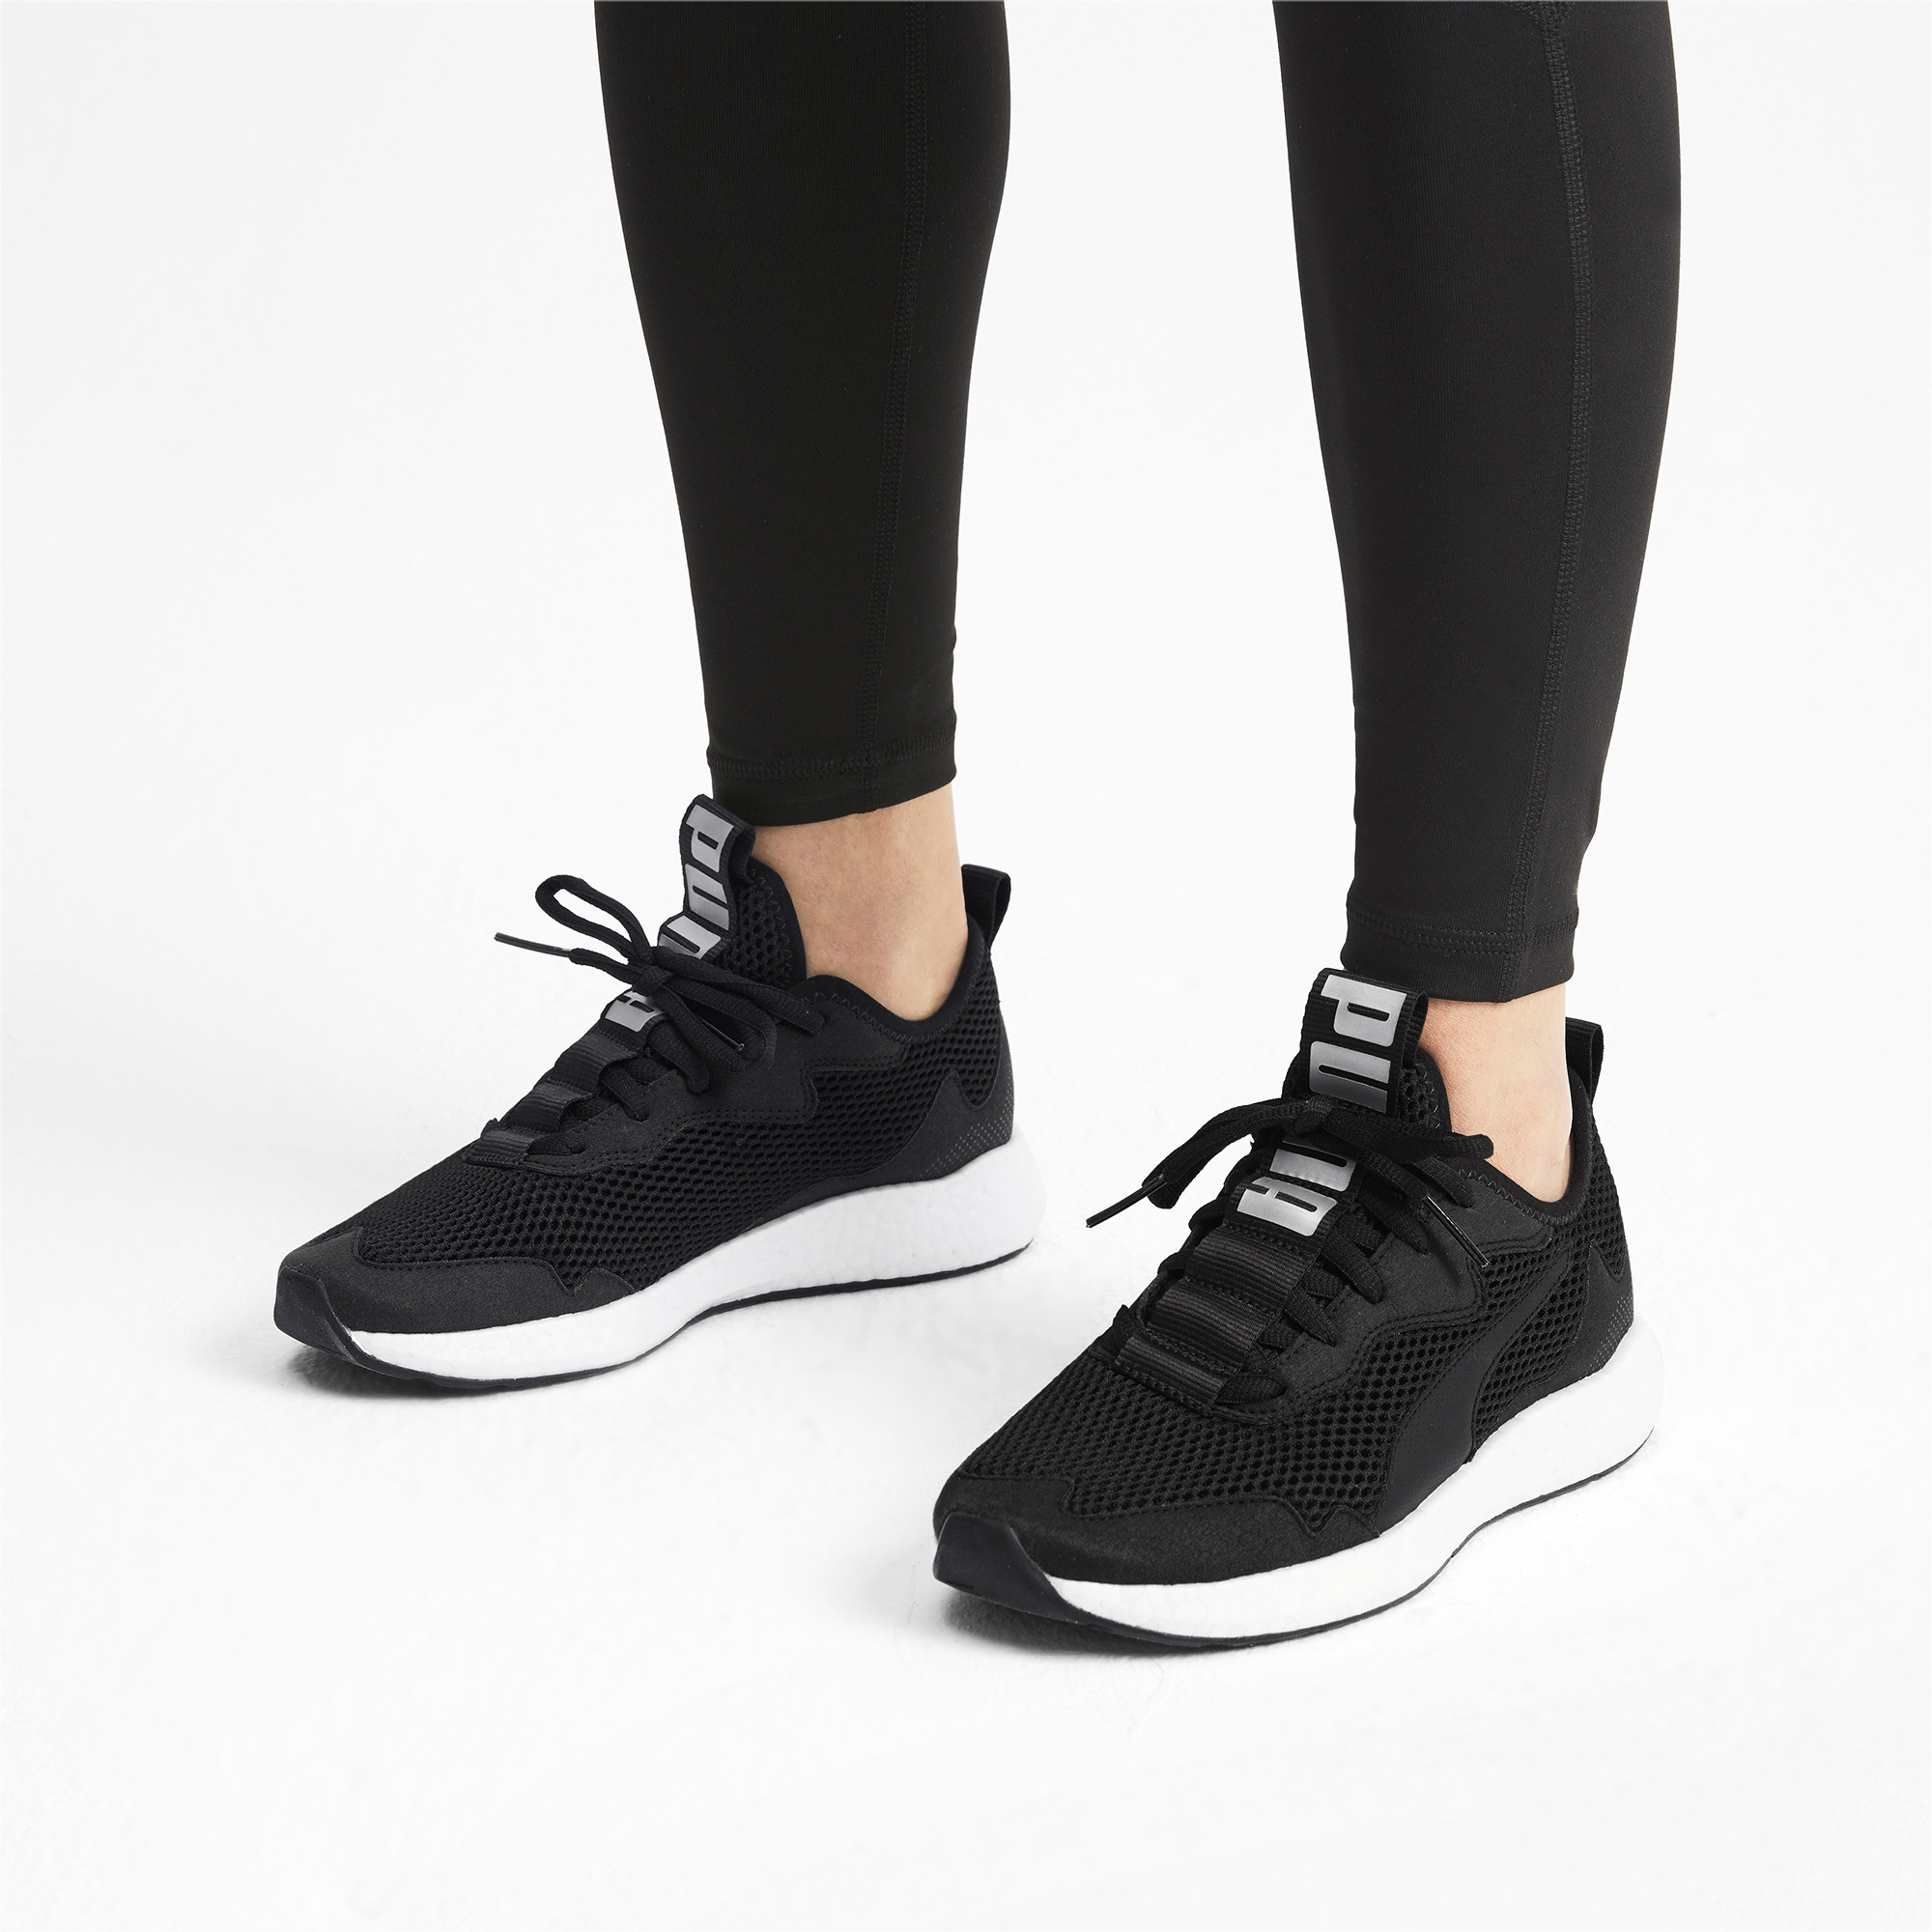 PUMA-Women-039-s-NRGY-Neko-Skim-Running-Shoes thumbnail 12